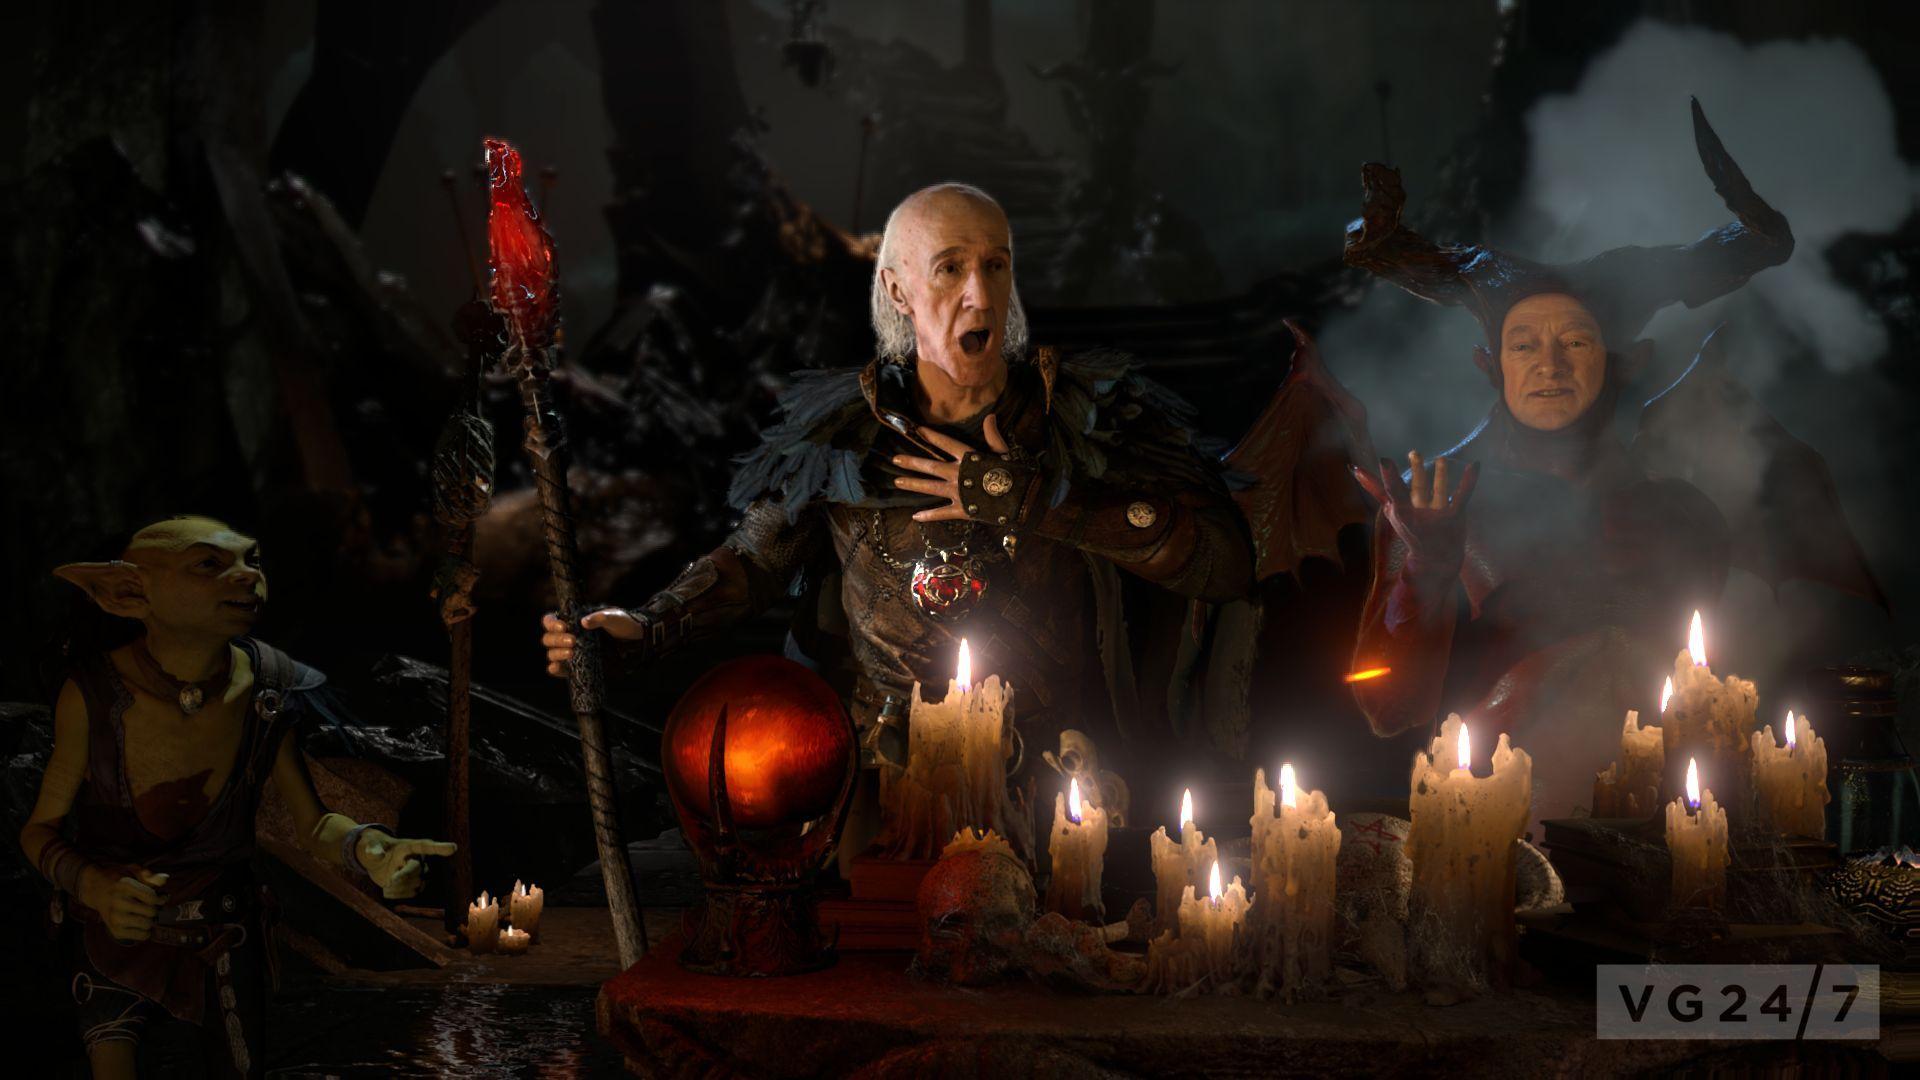 Gothic Girl Wallpaper Fantasy The Dark Sorcerer Announced Tech Demo Shown Vg247